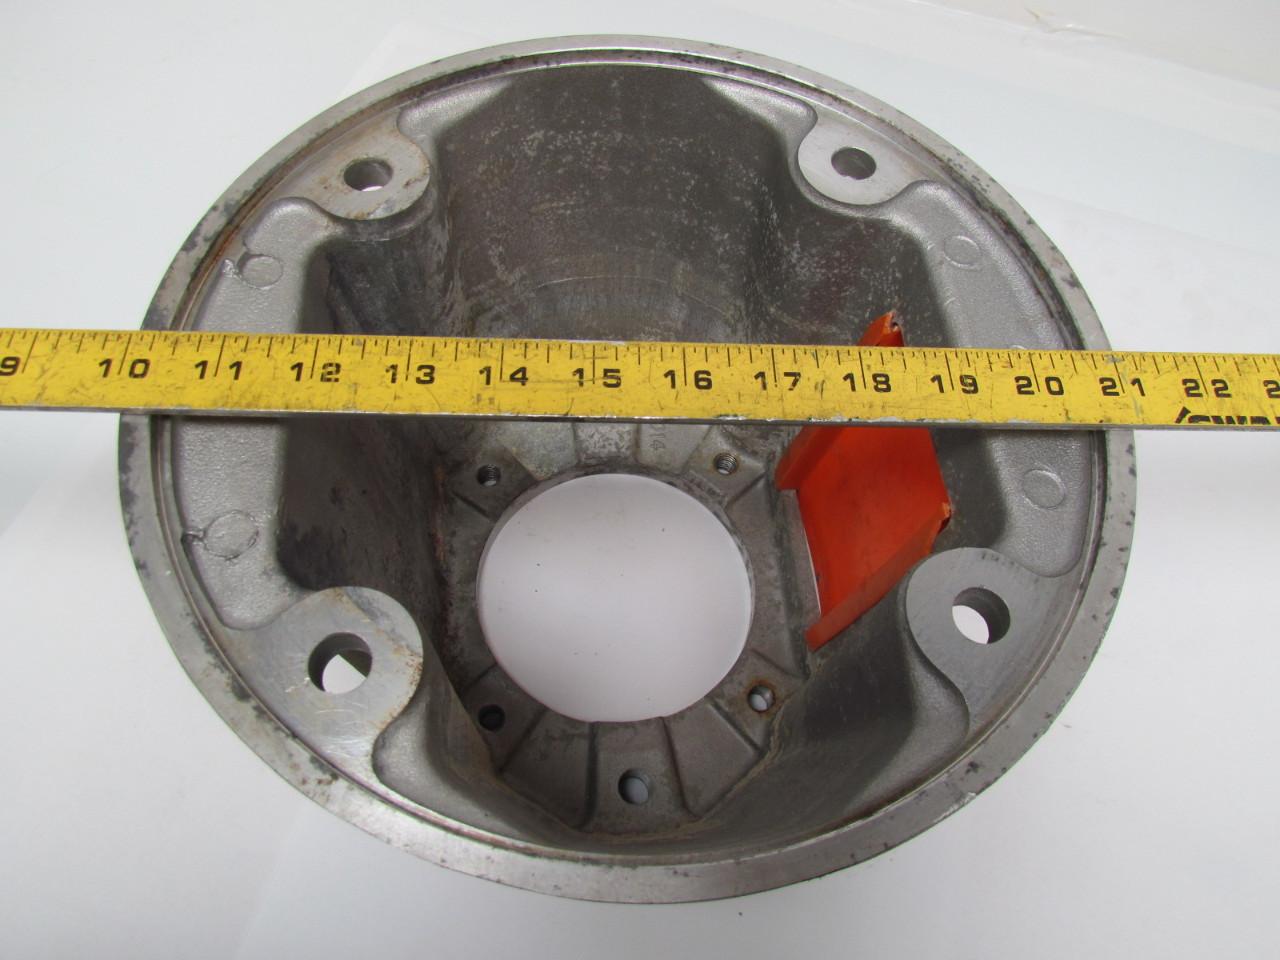 Vescor 1956 pump motor adapter bell housing style 8 for Hydraulic pump motor adapter